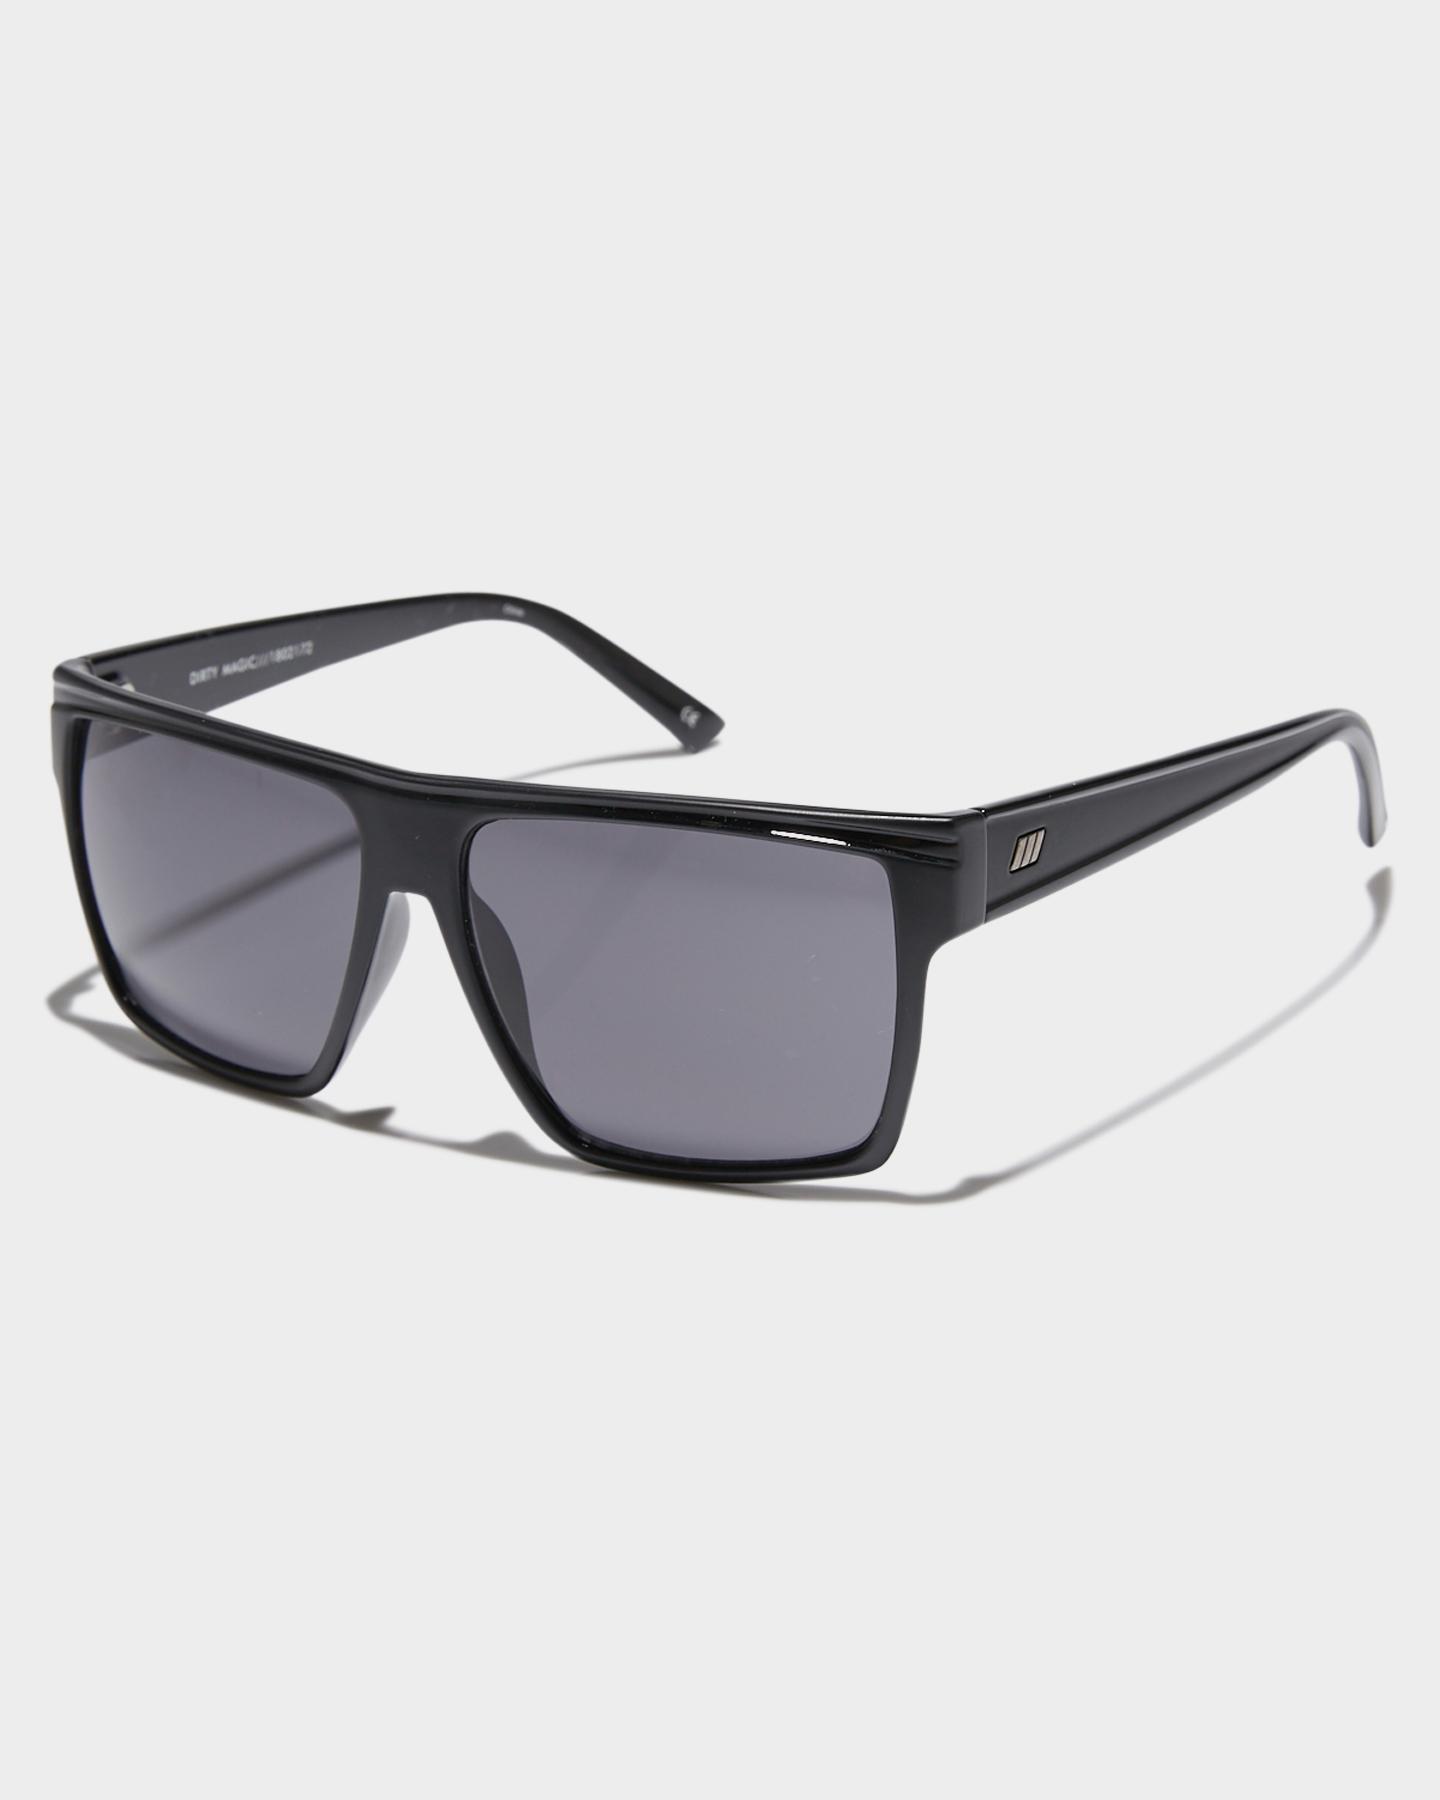 4aaeffc3fb9 Le Specs Men s Dirty Magic Sunglasses Glass Black 9324976267559